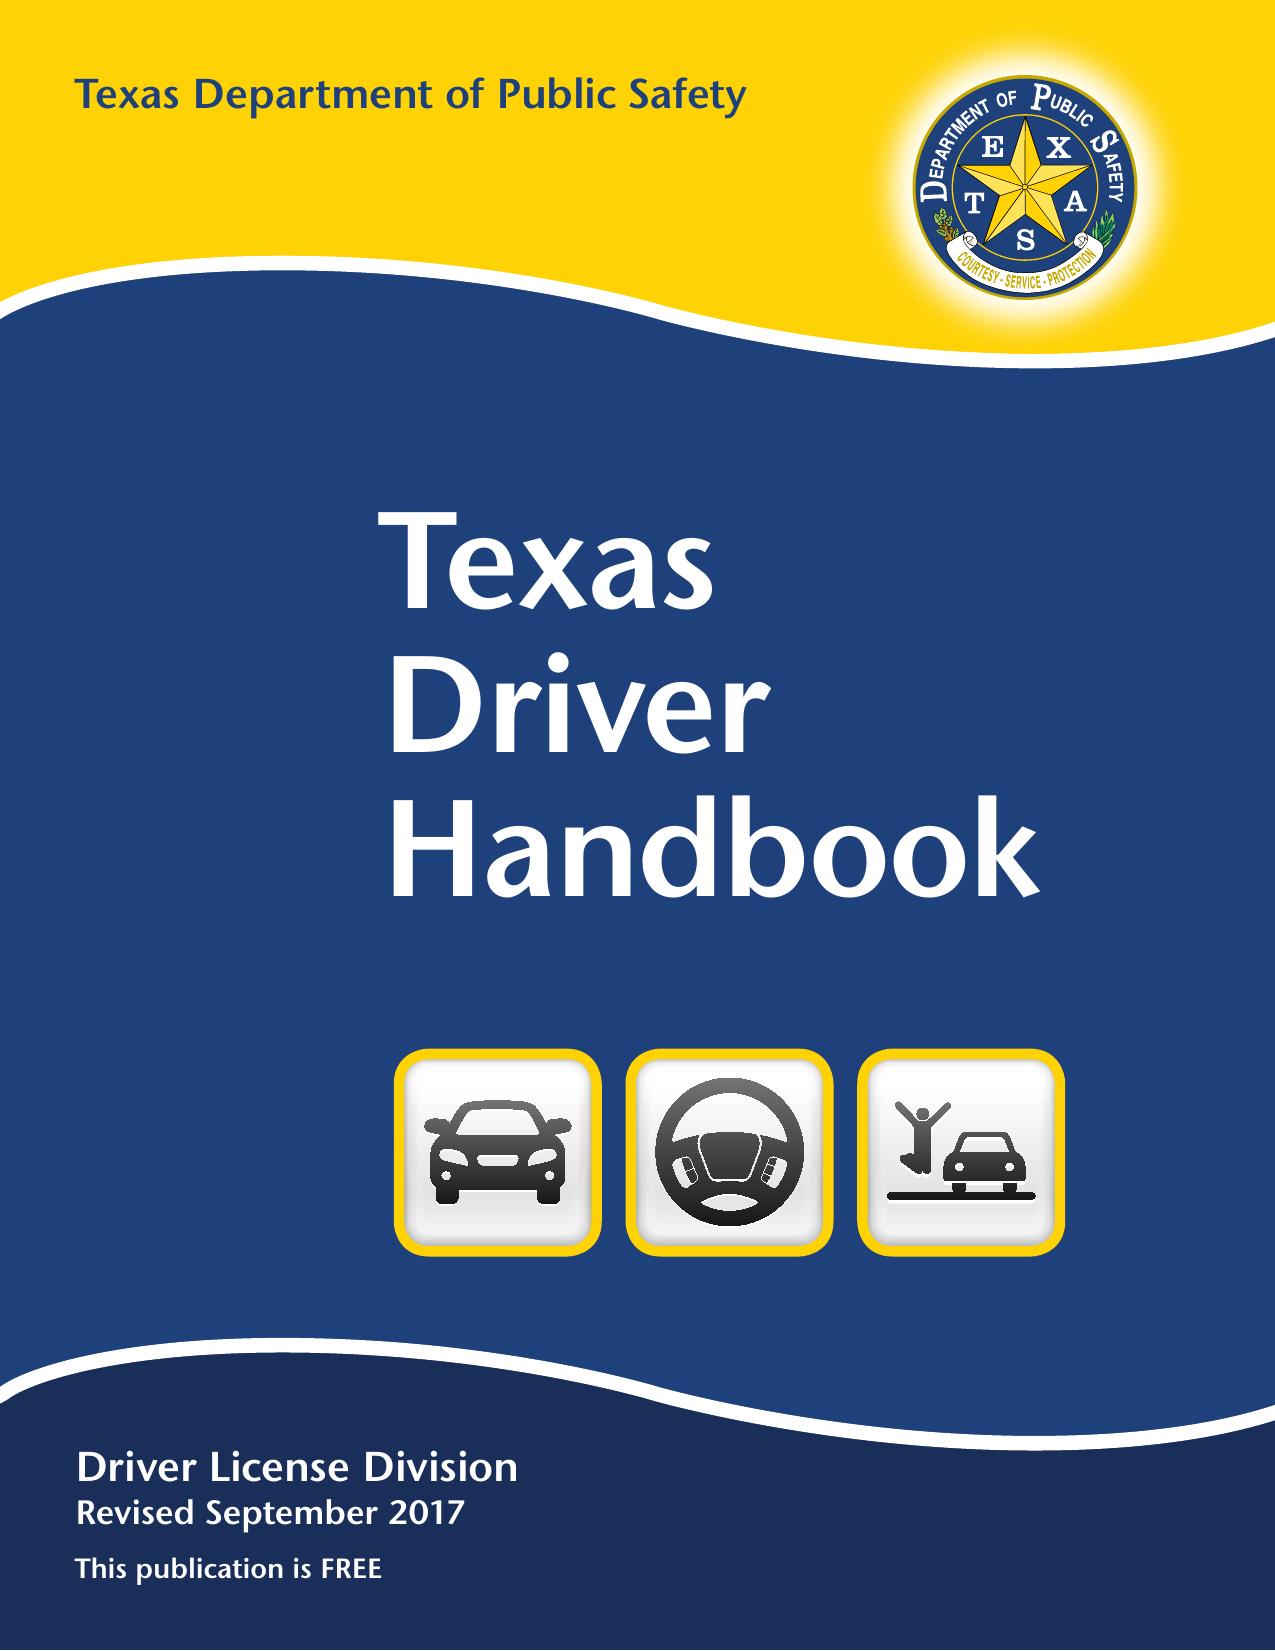 Texas Driver Handbook